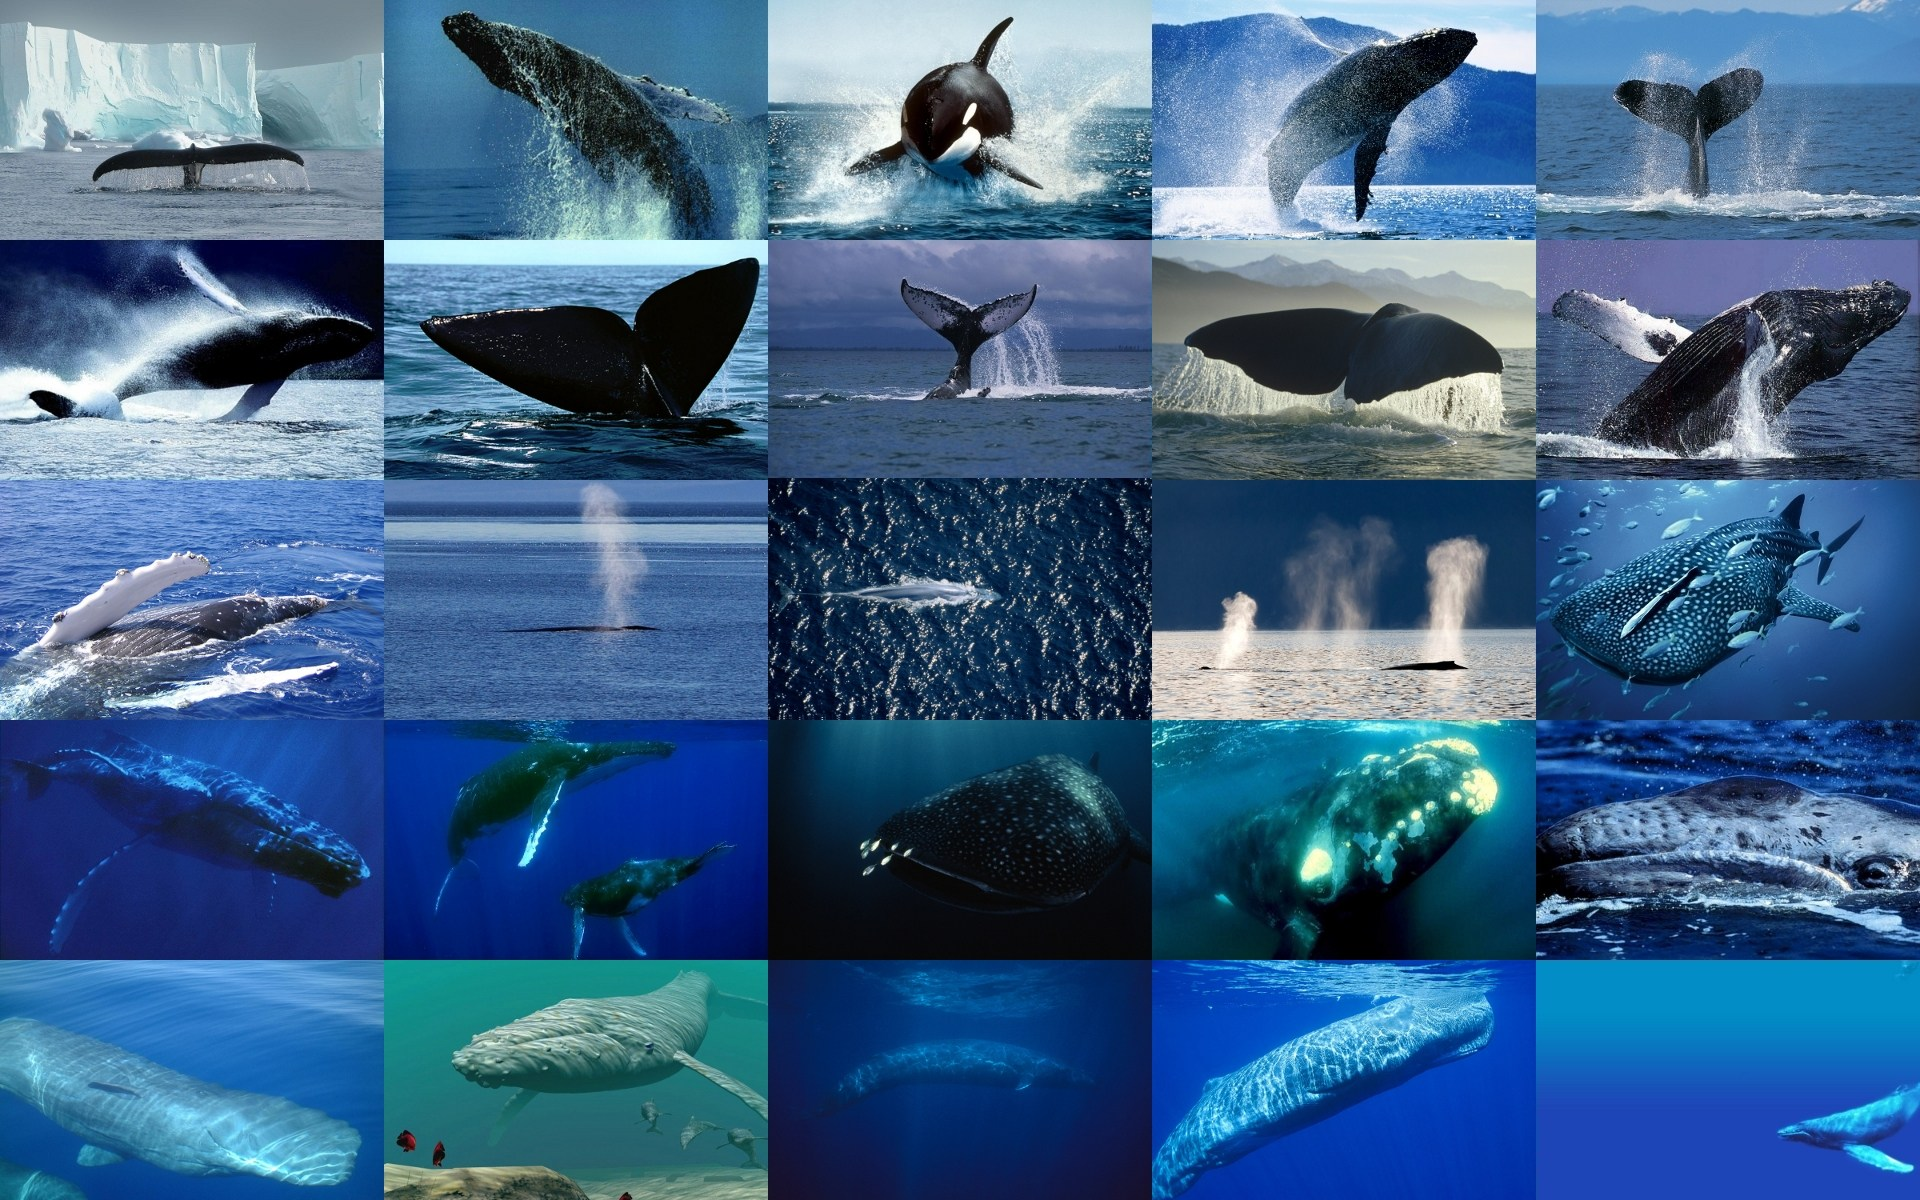 Image baleines - baleine, adorable, cachalot, requin, poisson, océan, mer, bleu, plongeur, orque